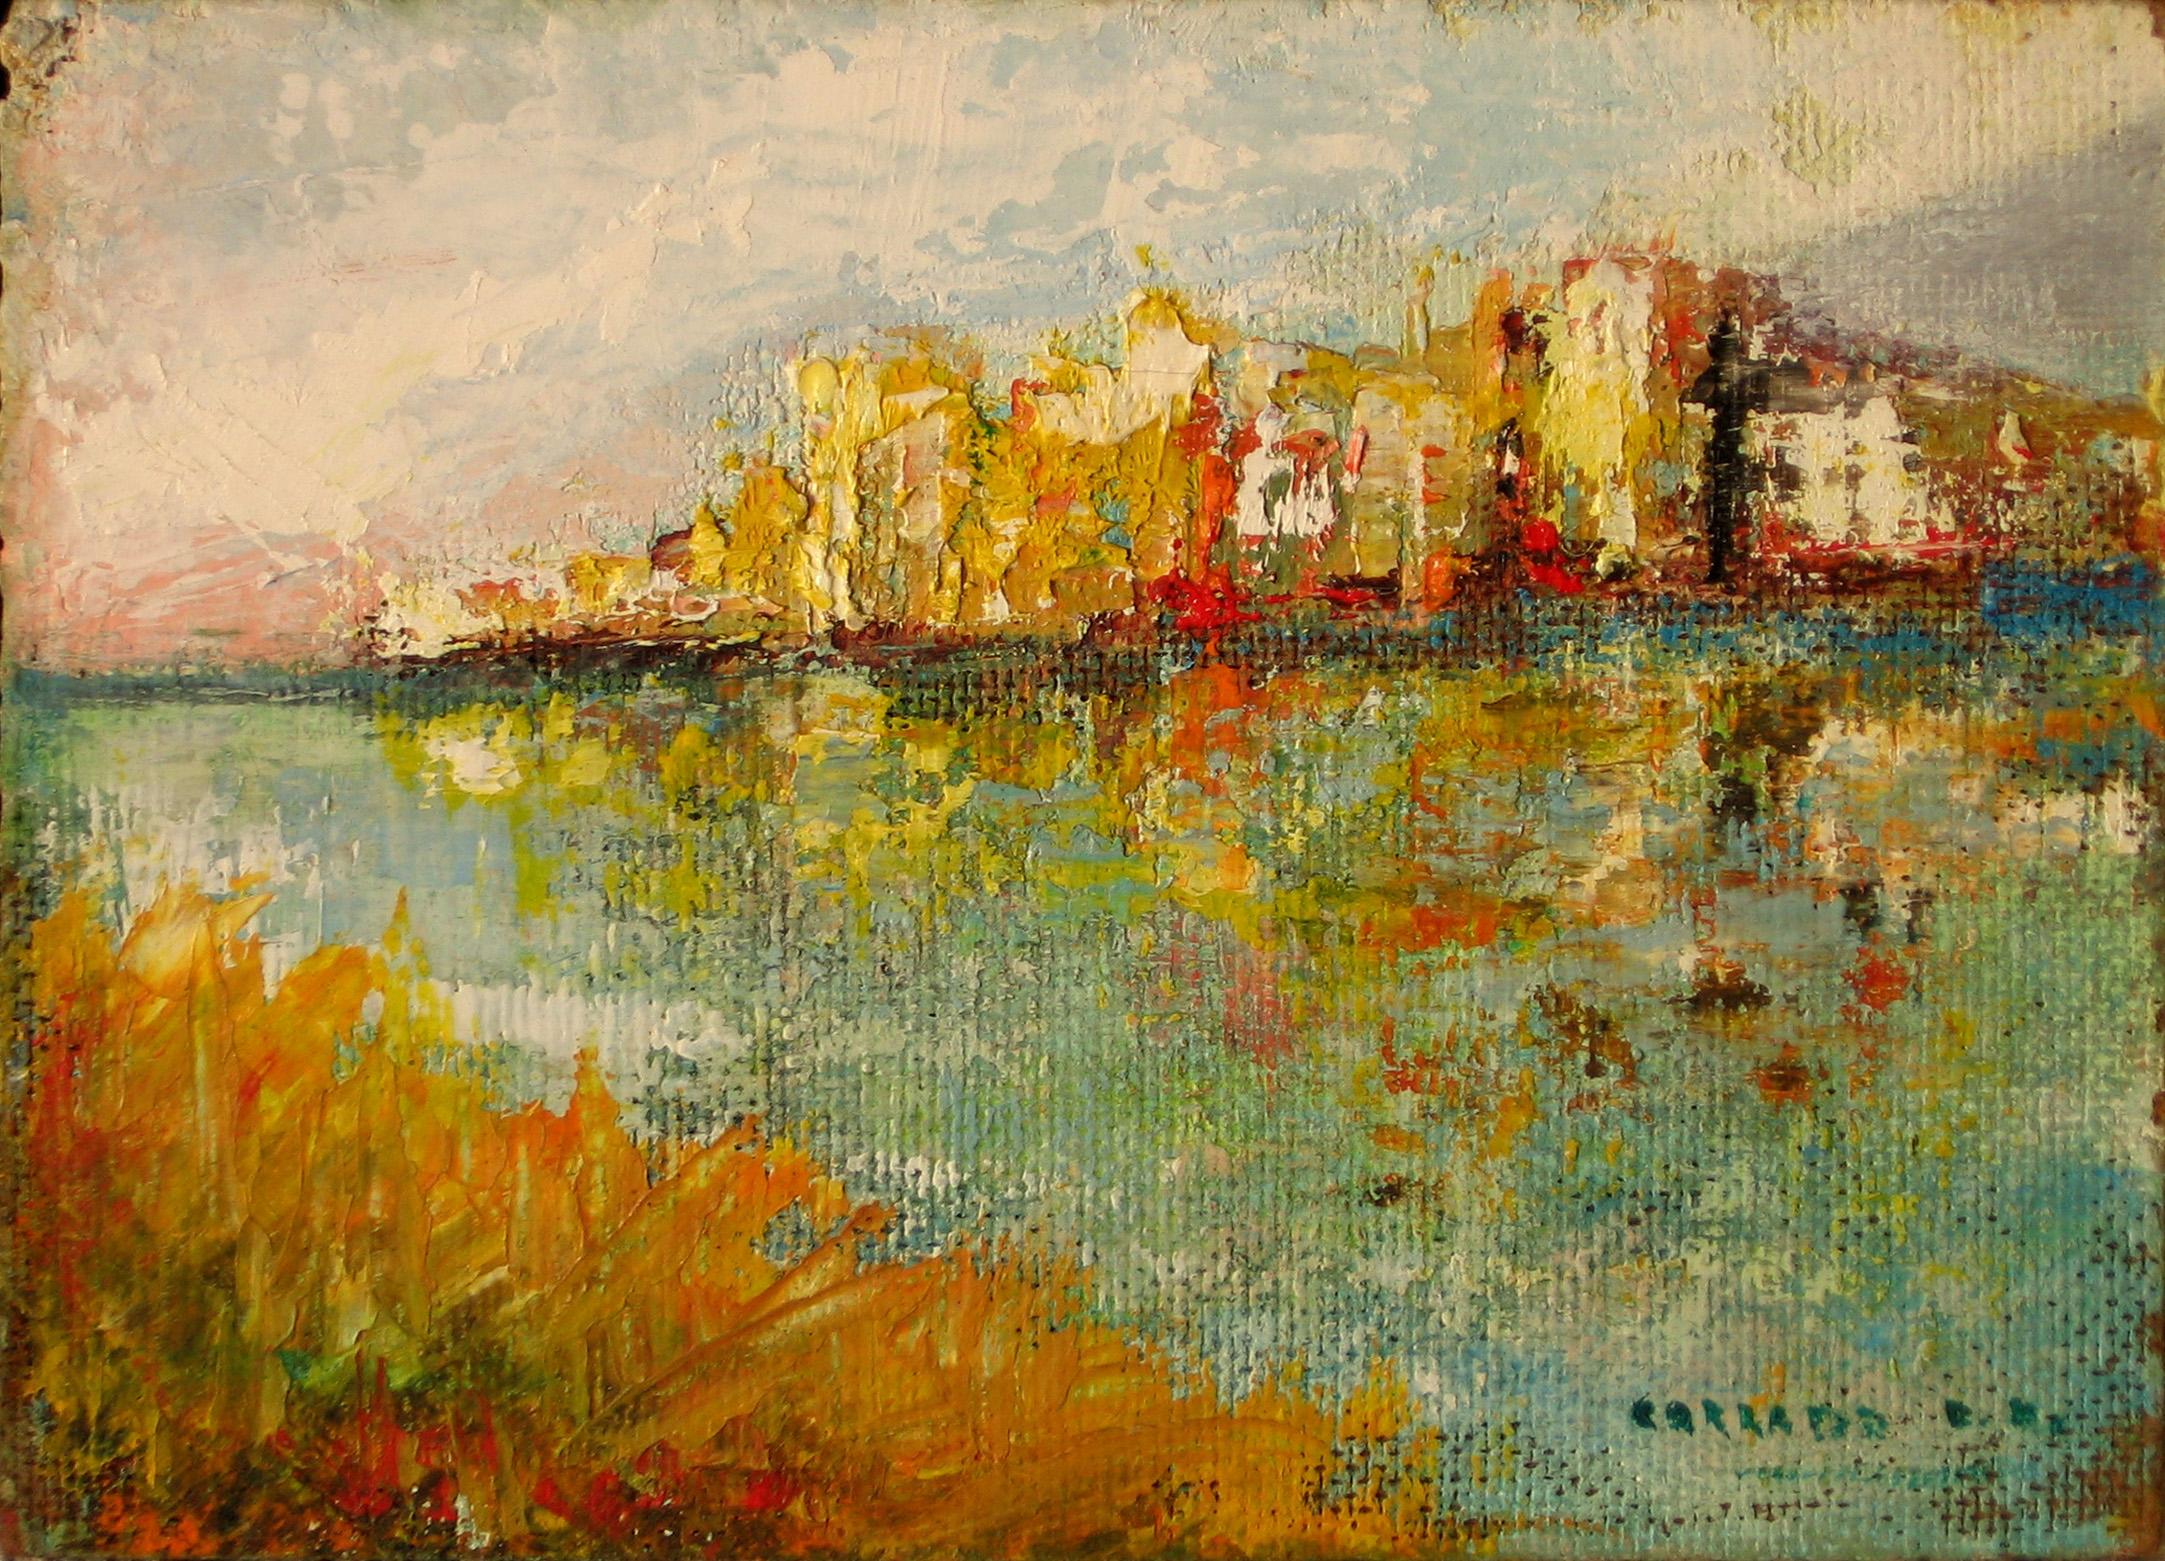 Estremamente Galleria - Categoria: Dipinti - Foto: Paesaggio DZ71